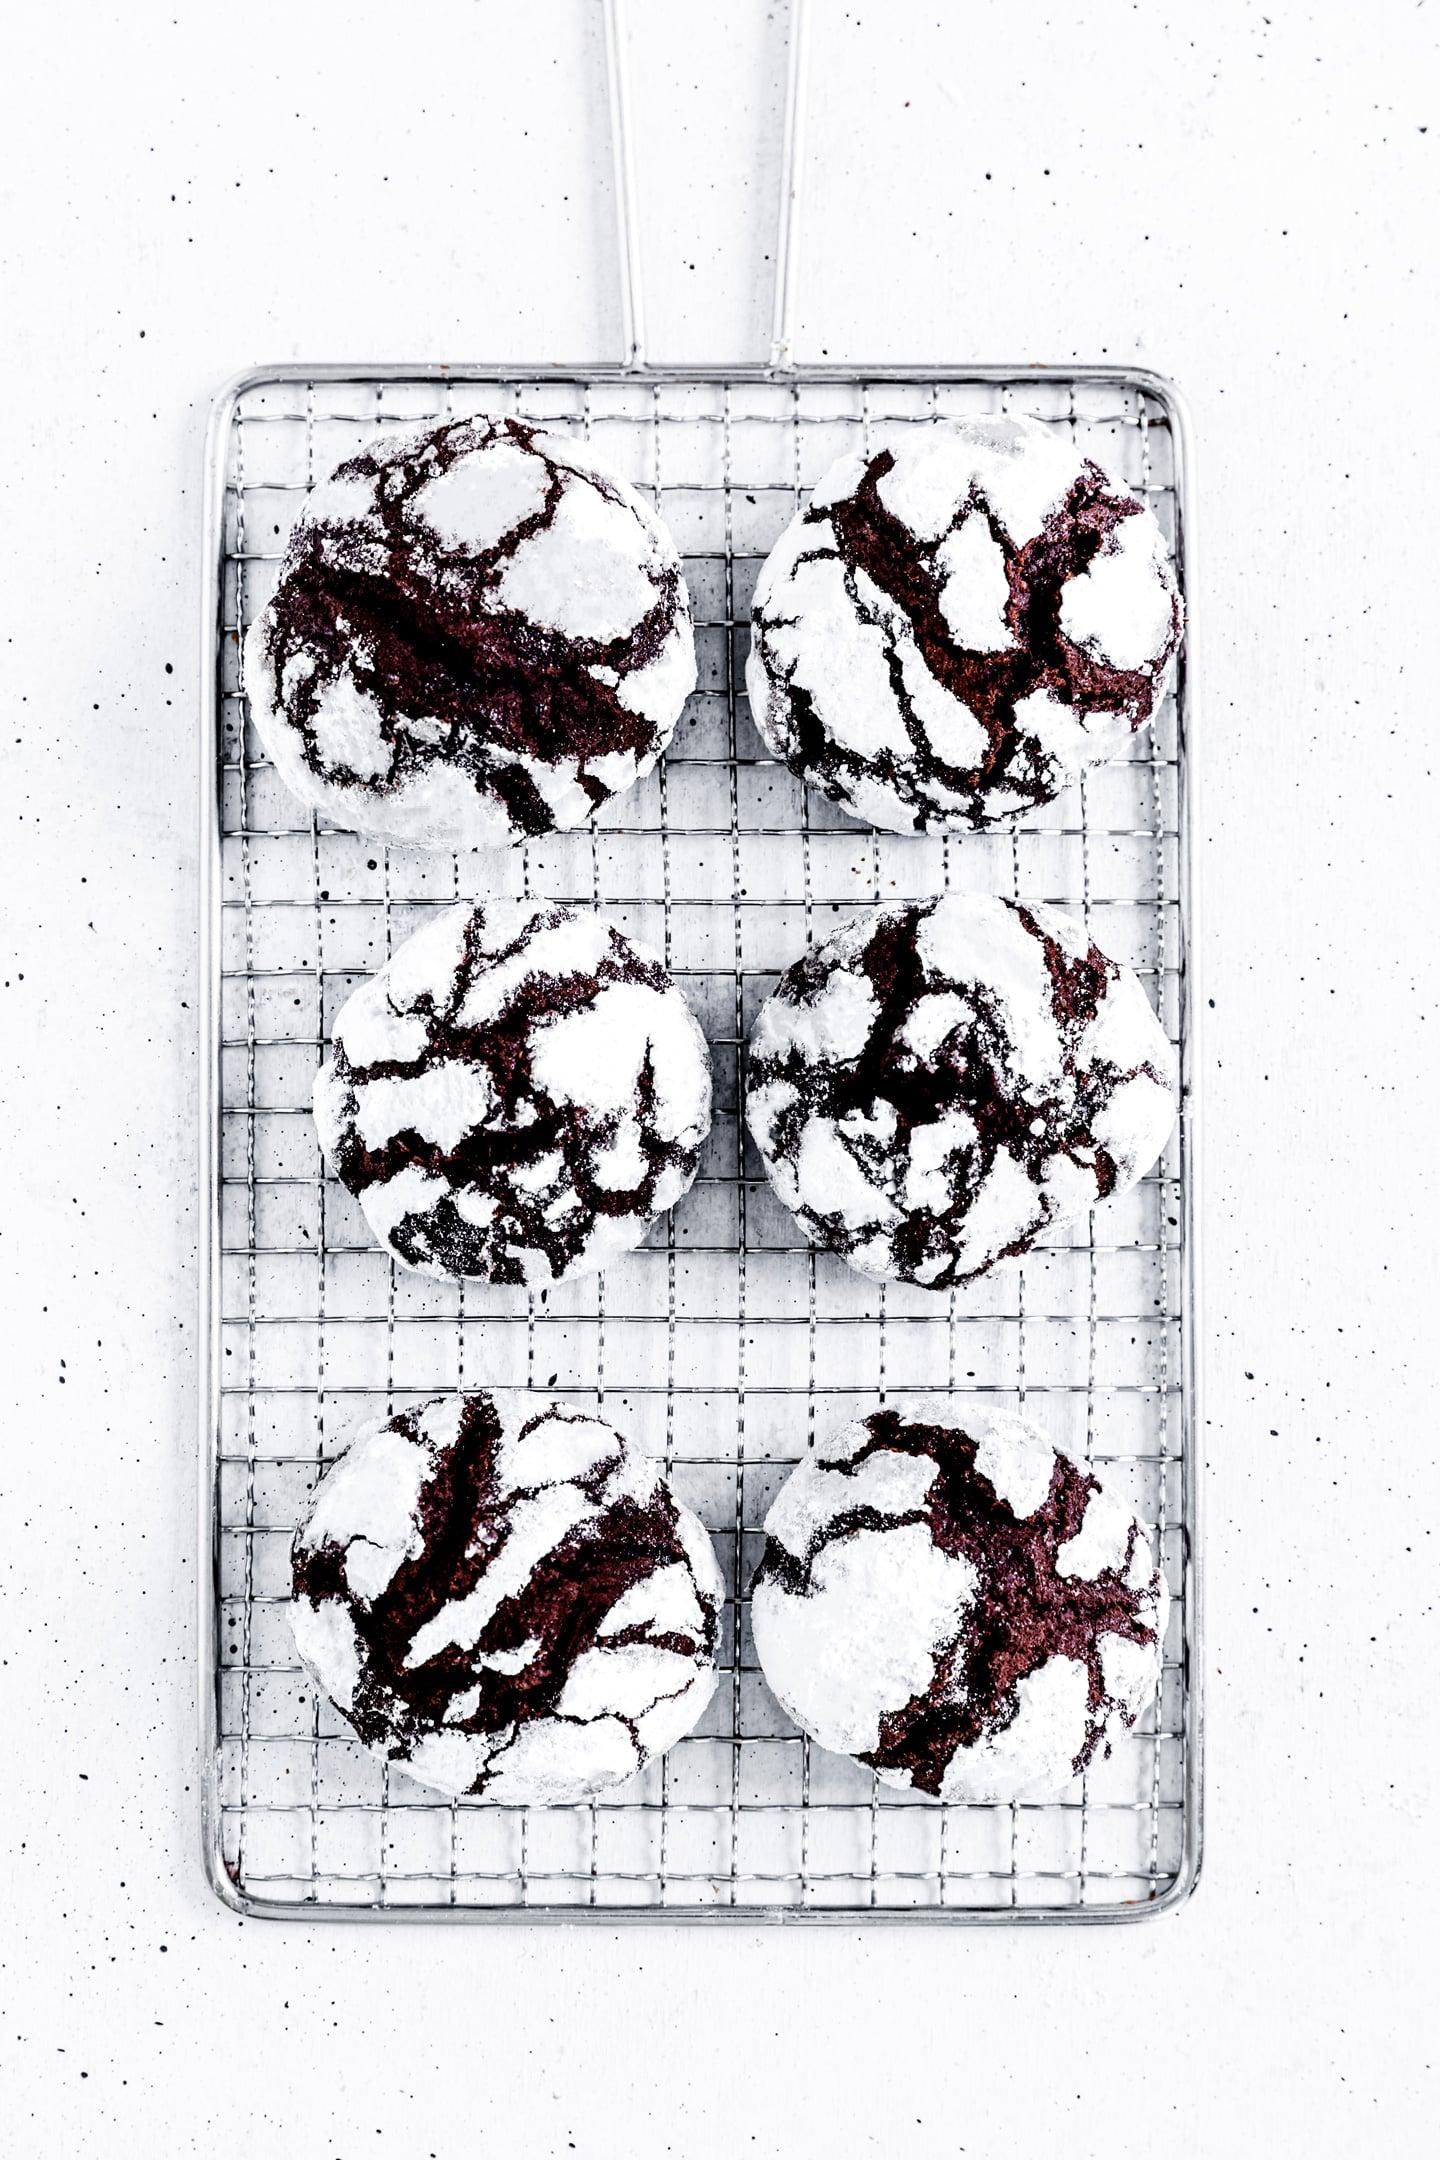 Les crinkles au chocolat